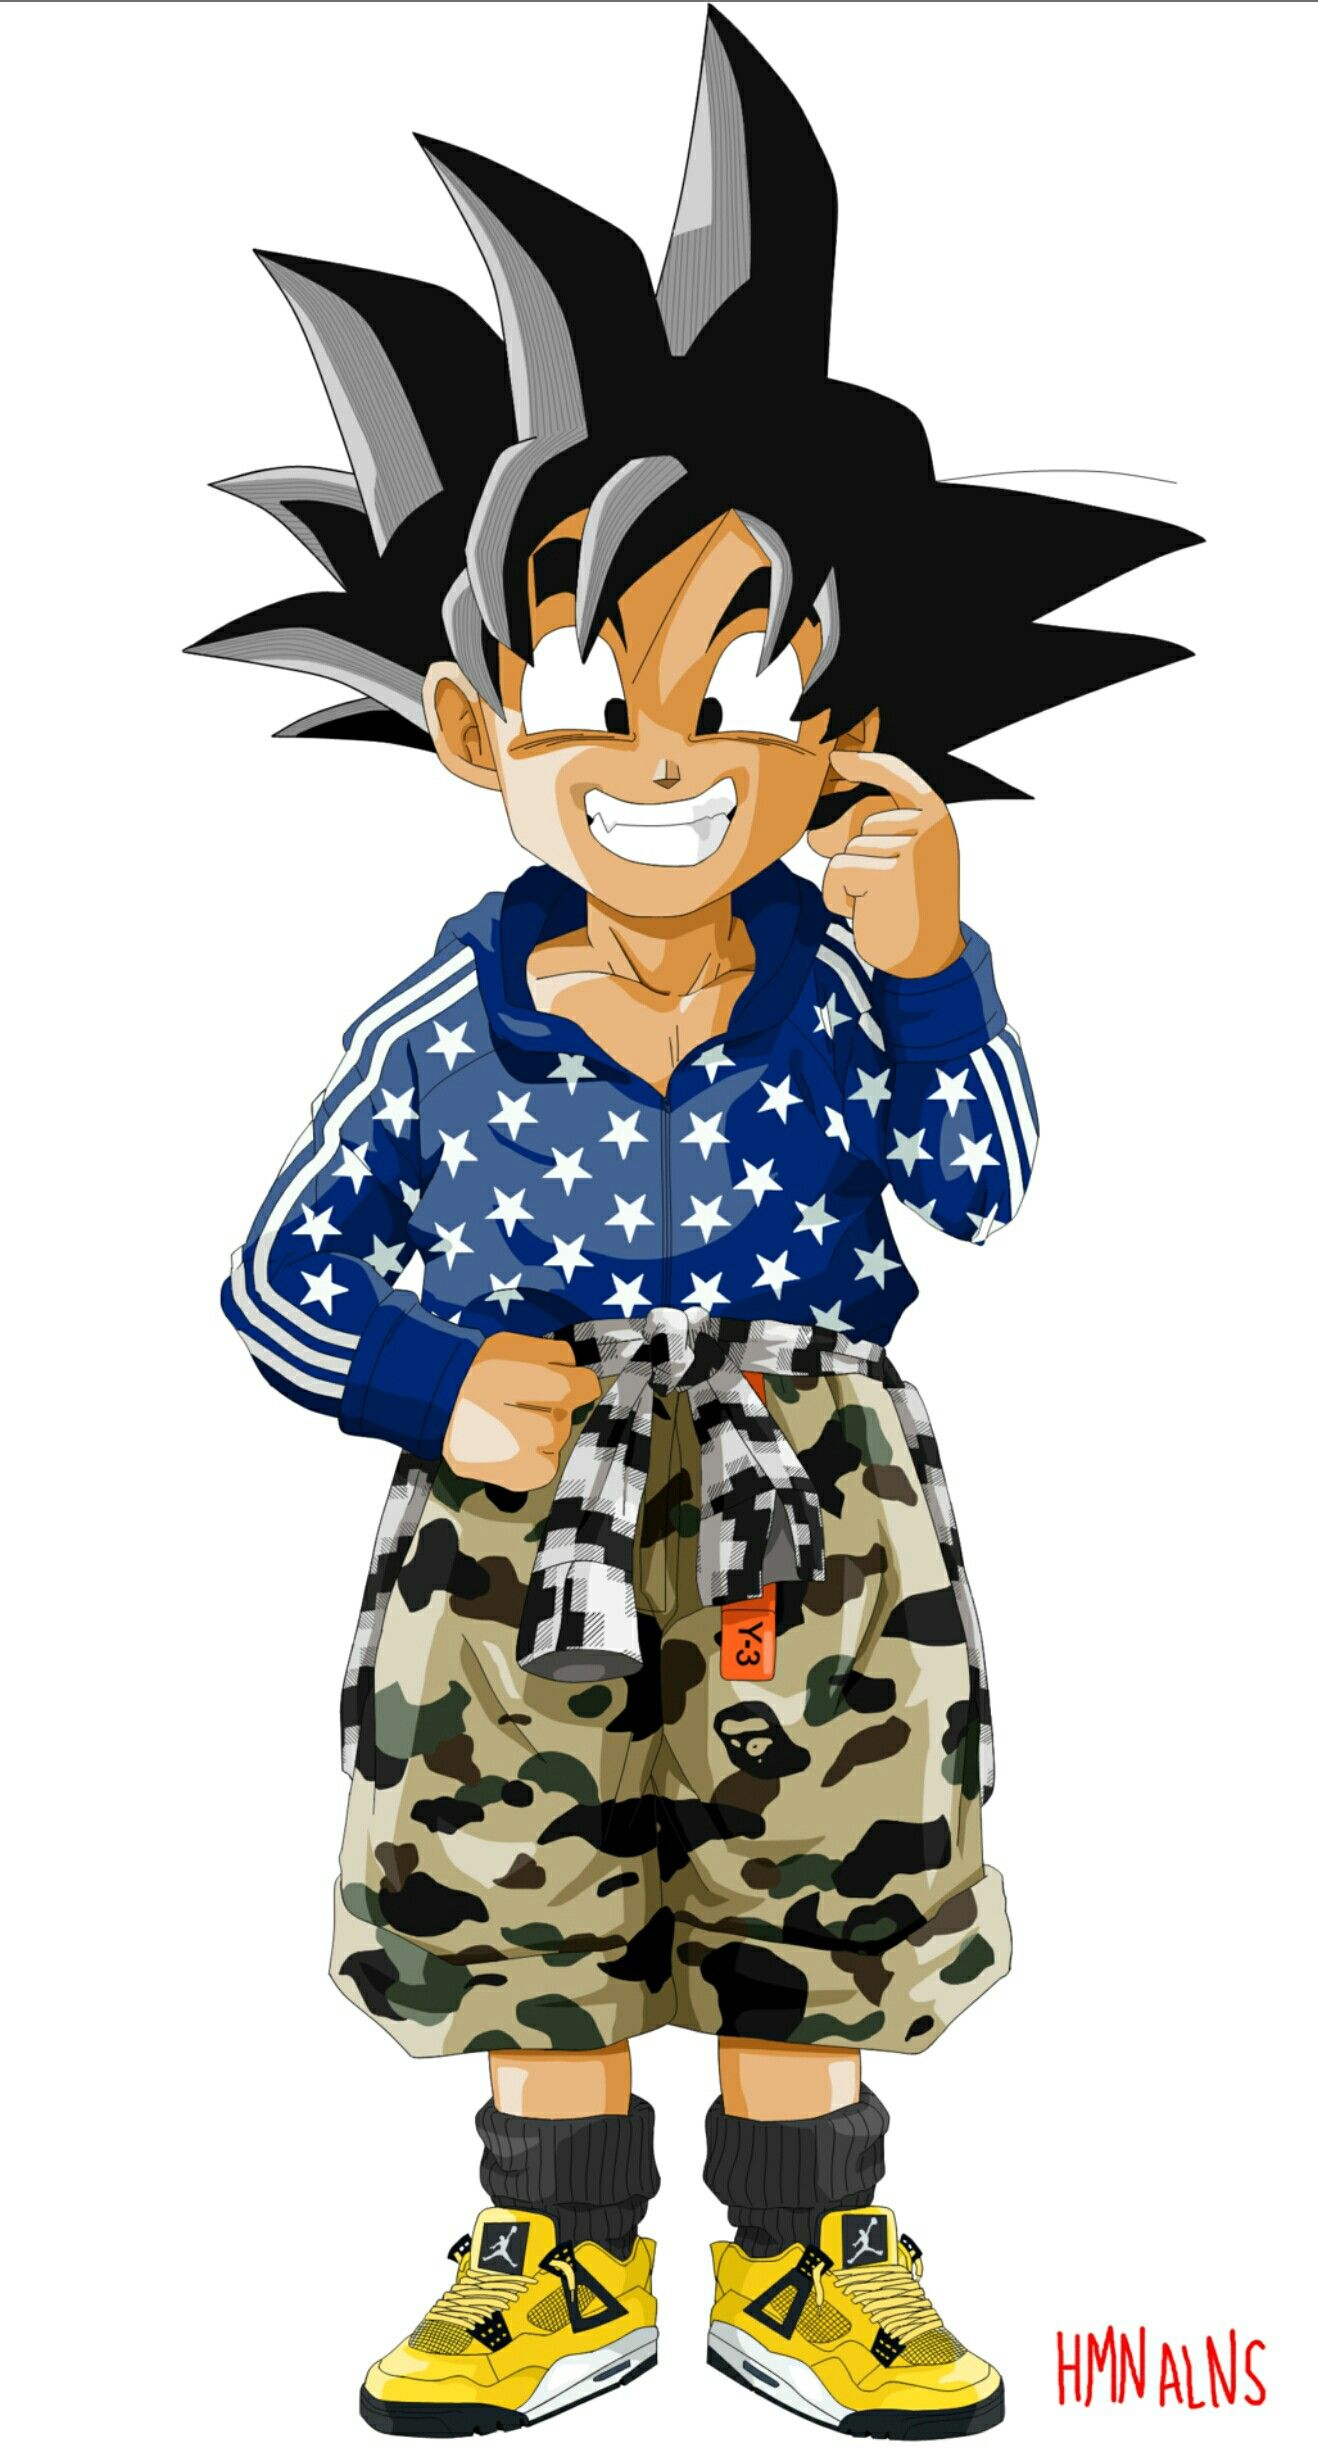 56d4ac24 Best Dragon Ball Hmn Alns Hypebeast images on Designspiration. Dragonball  Fashion Son Goku pic on Design You Trust. Bape x DBZ